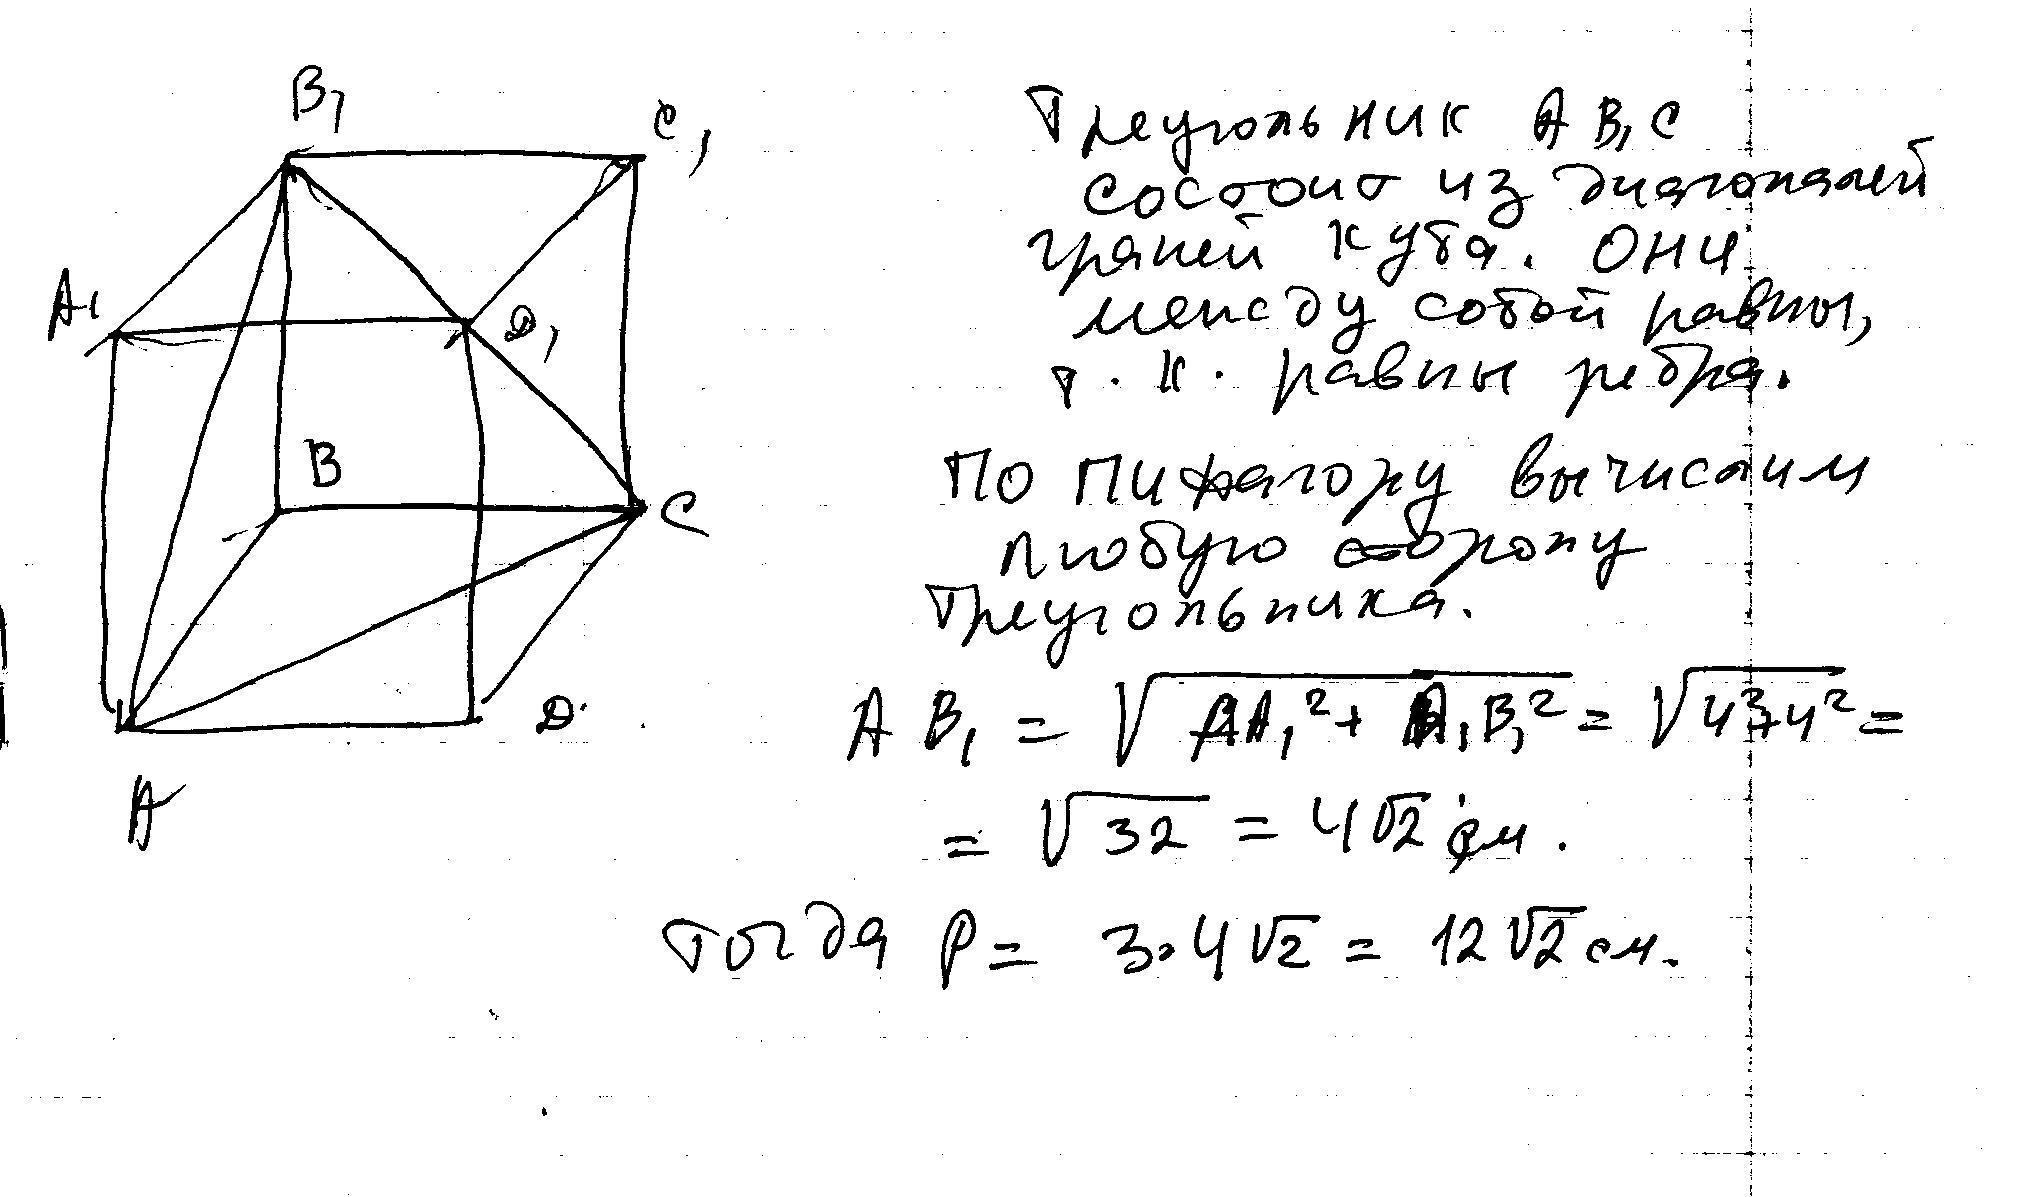 длина ребра куба abcda1b1c1d1 равна 1